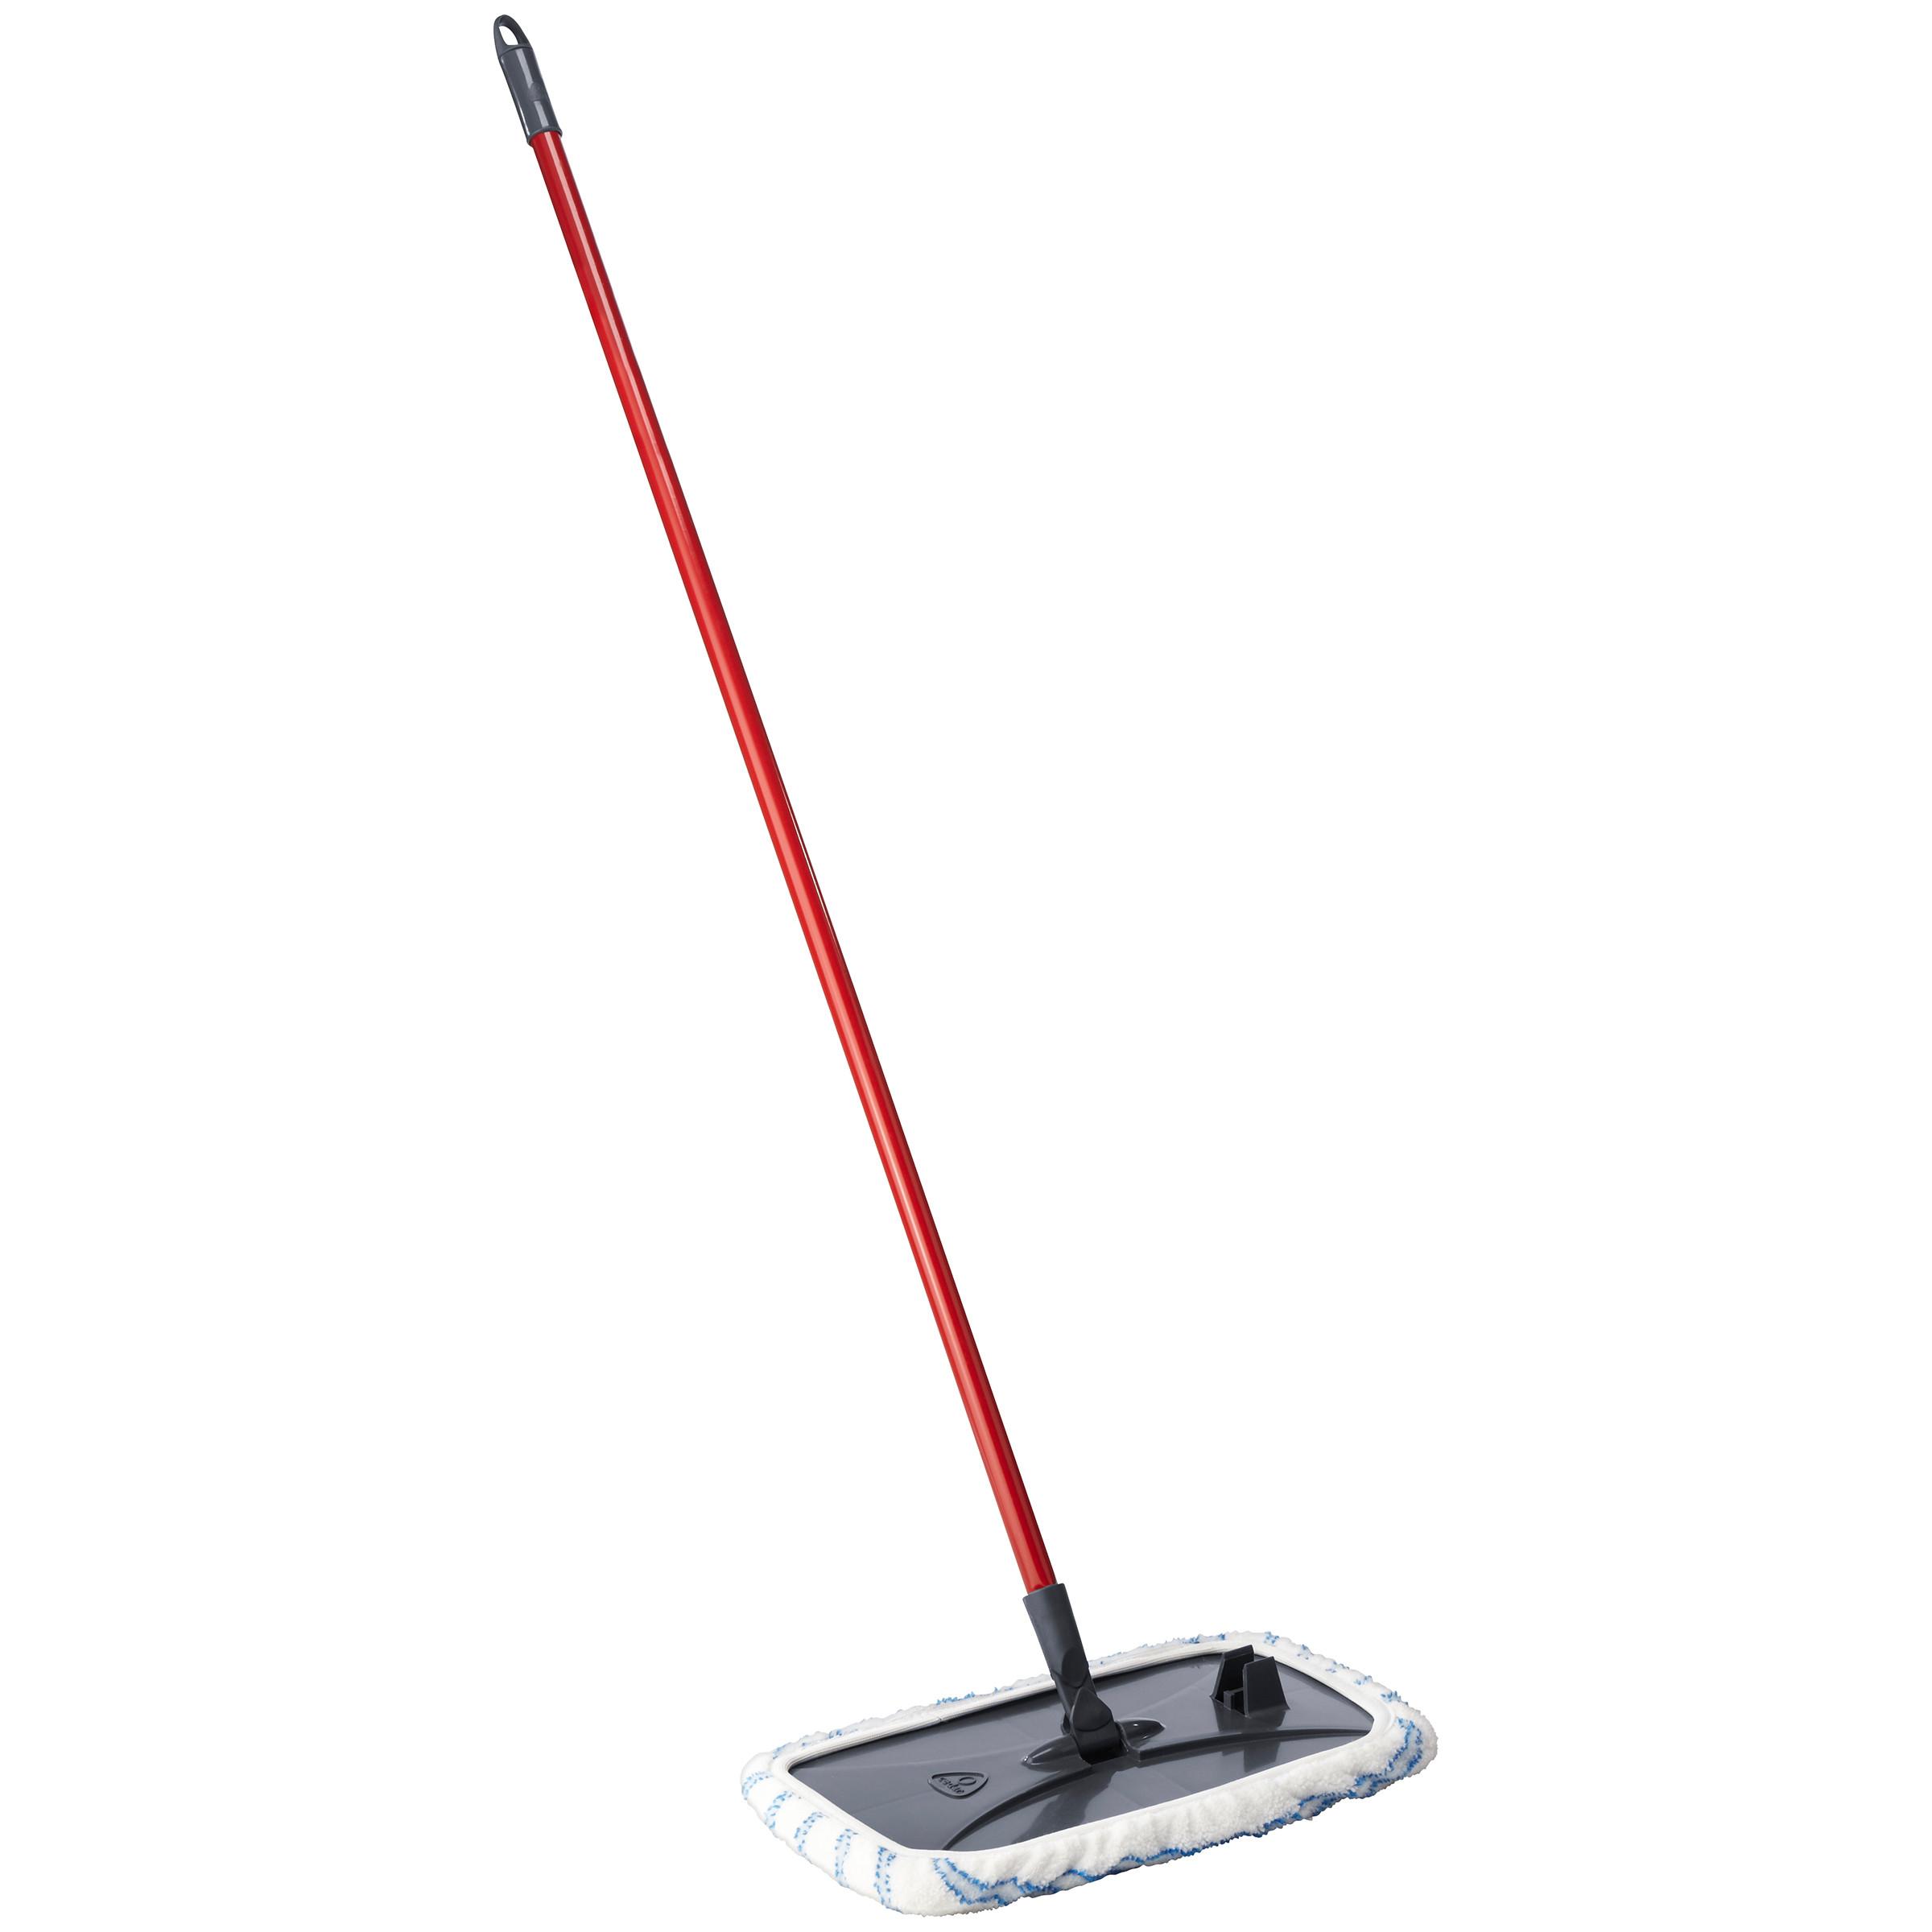 o cedar hardwood floor mop refill of o cedar hardwood floor n more mop walmart com pertaining to 5c59a591 a0e3 41dc a0f2 a38e02eb4ef2 1 af885ac9cdfc29da85414f4dba6b9980